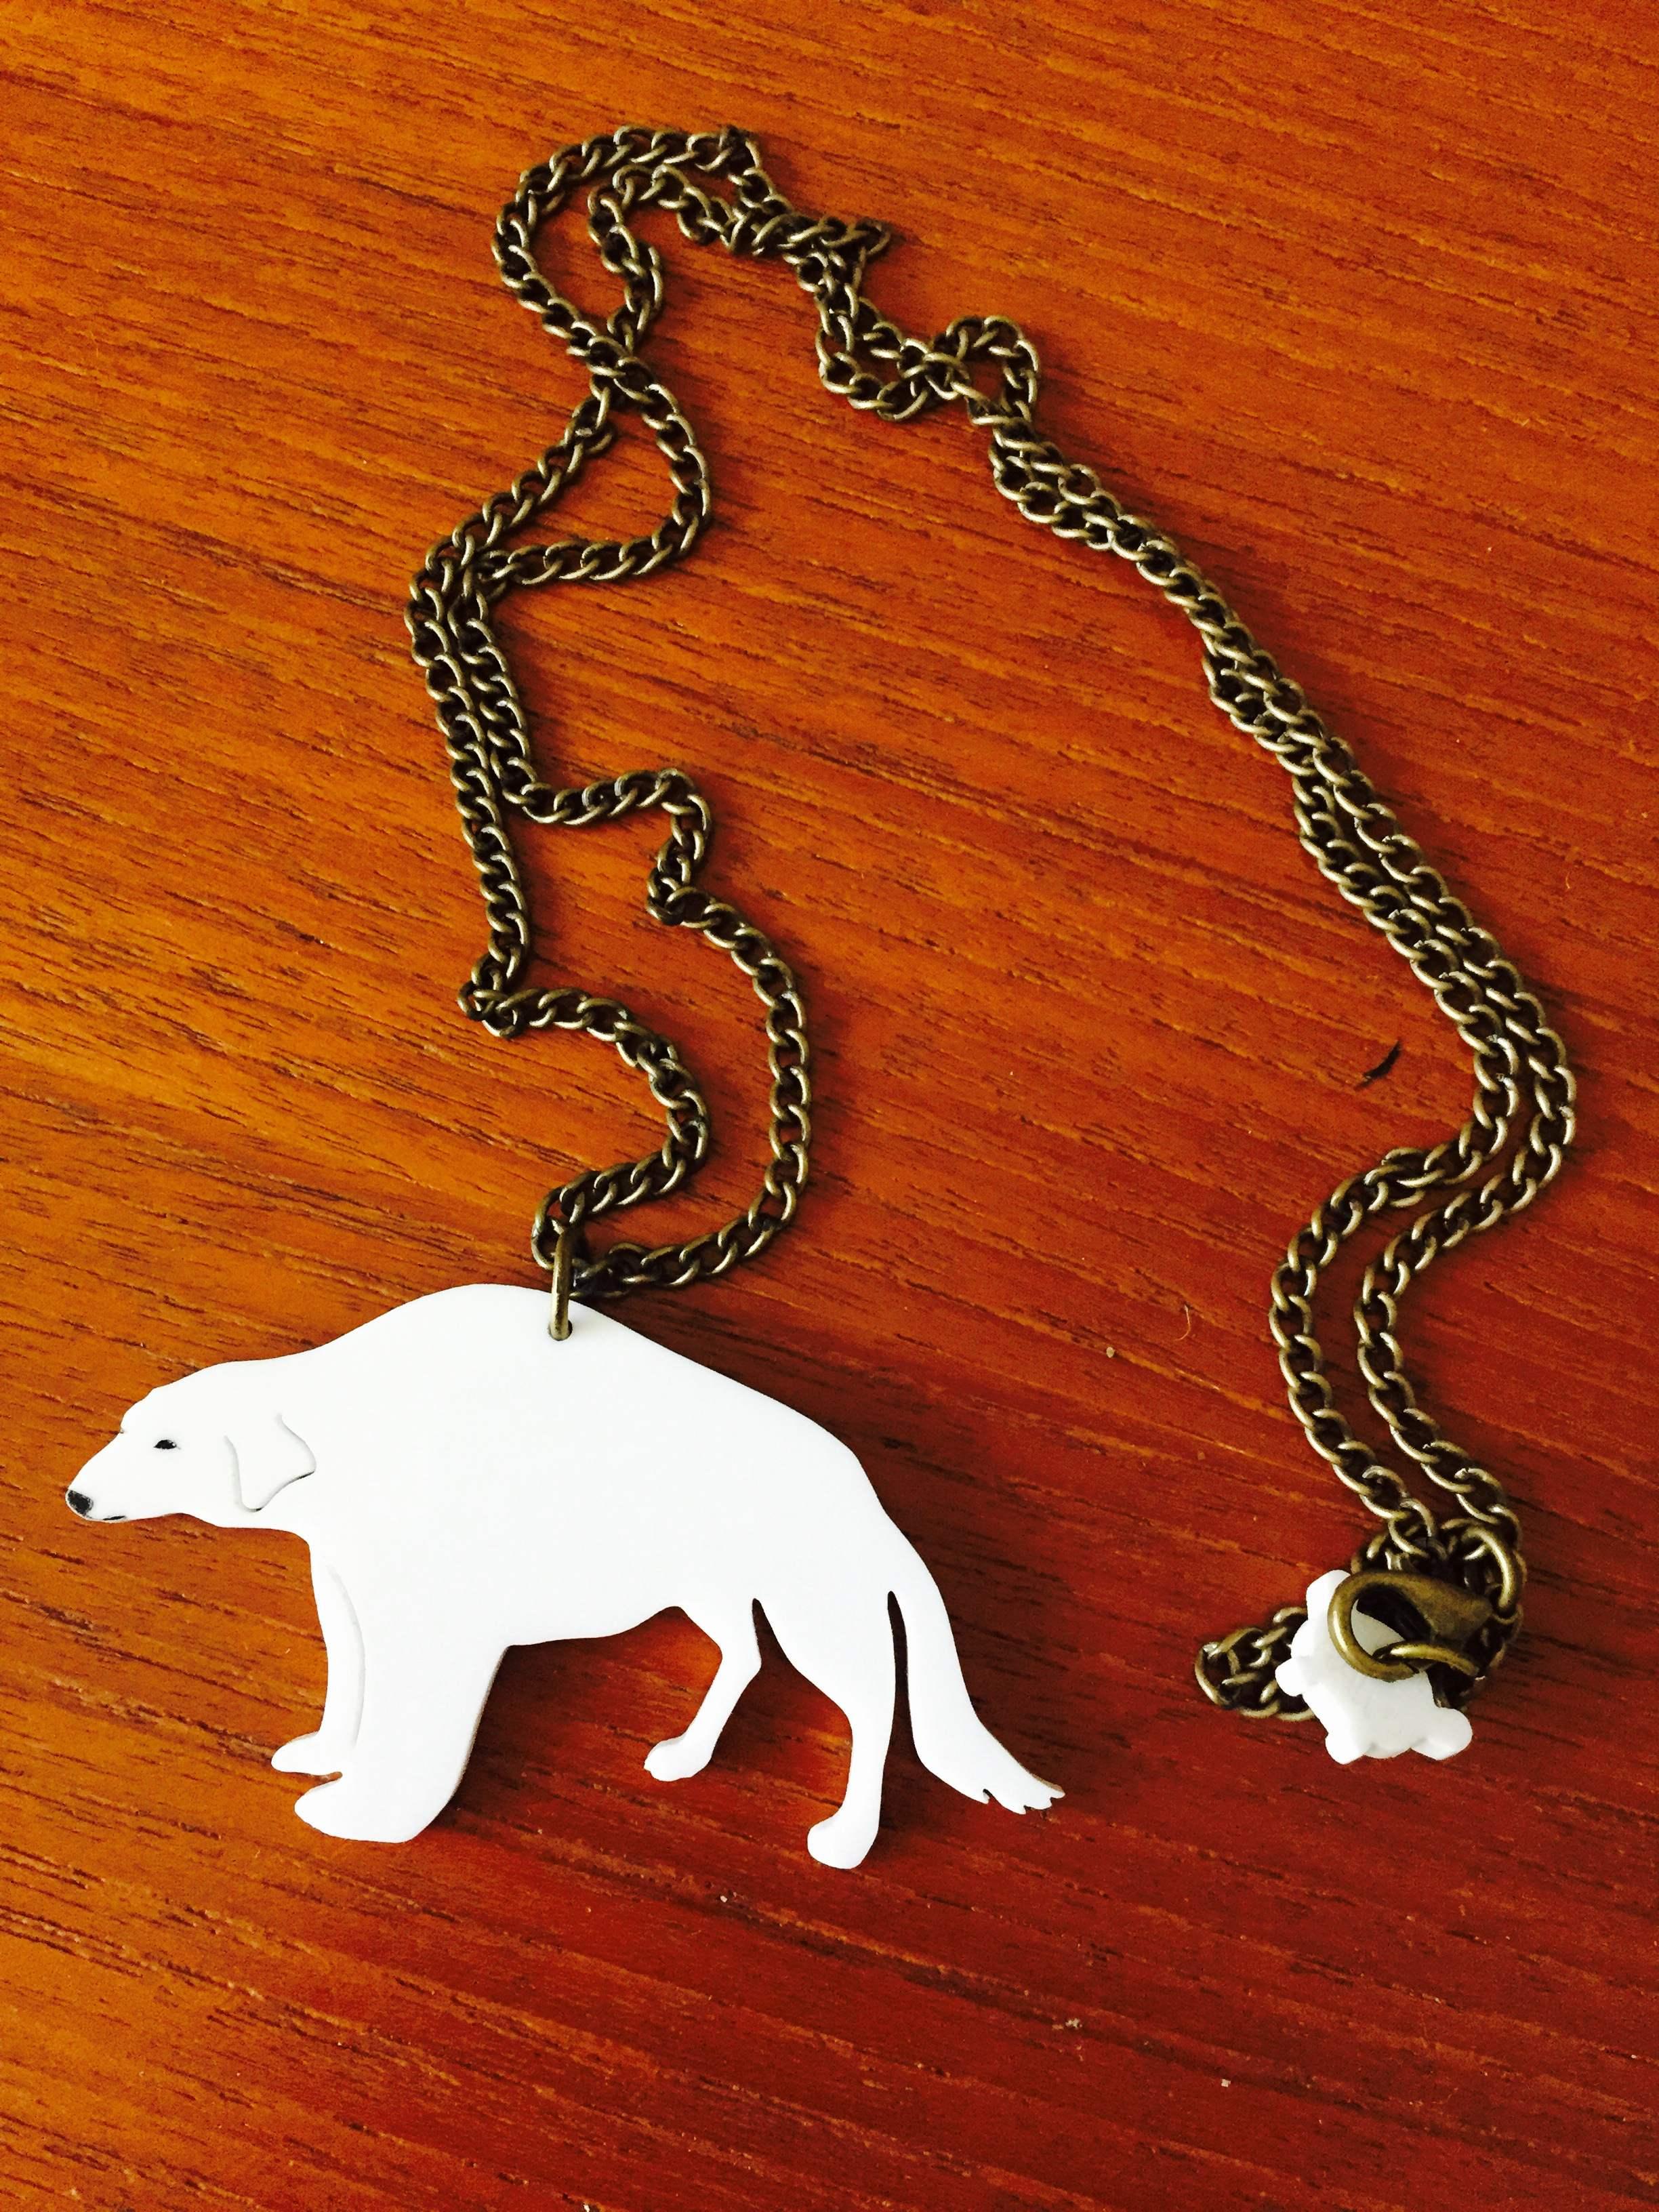 Autographed Naga Necklace